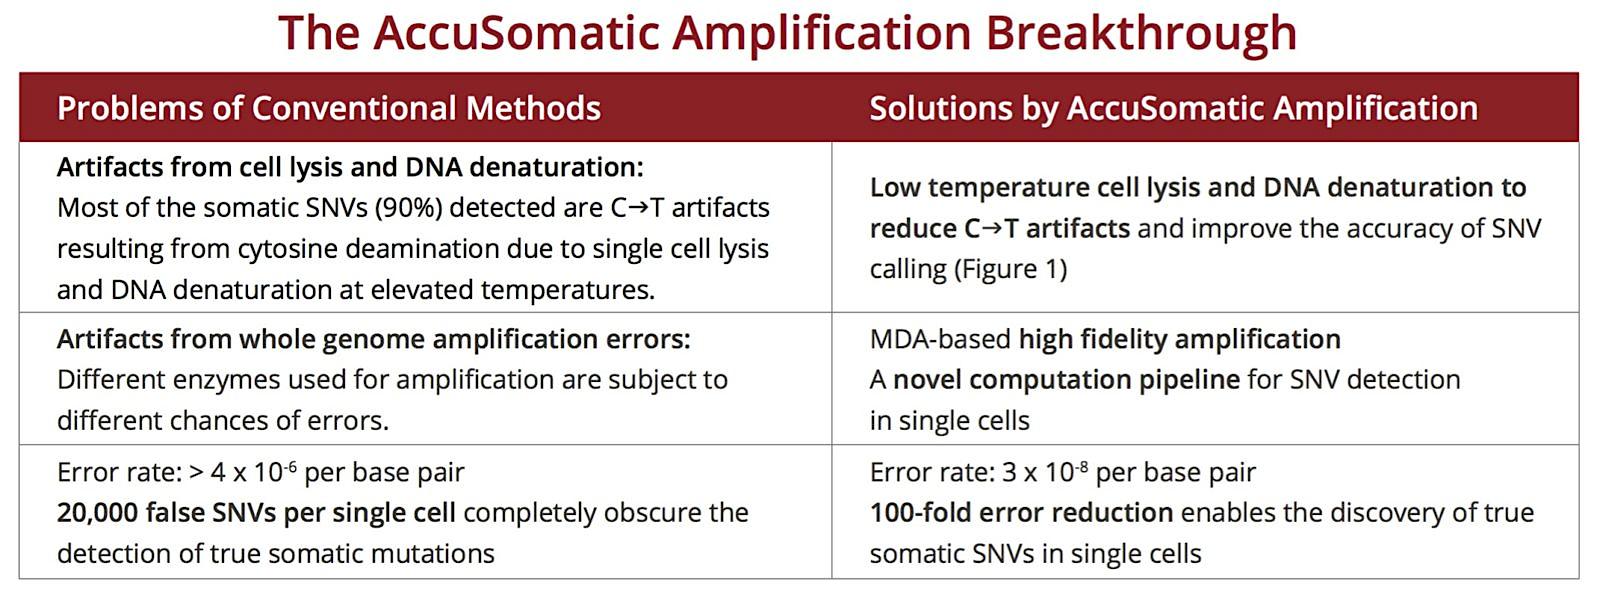 accusomatic-breakthrough-table-new